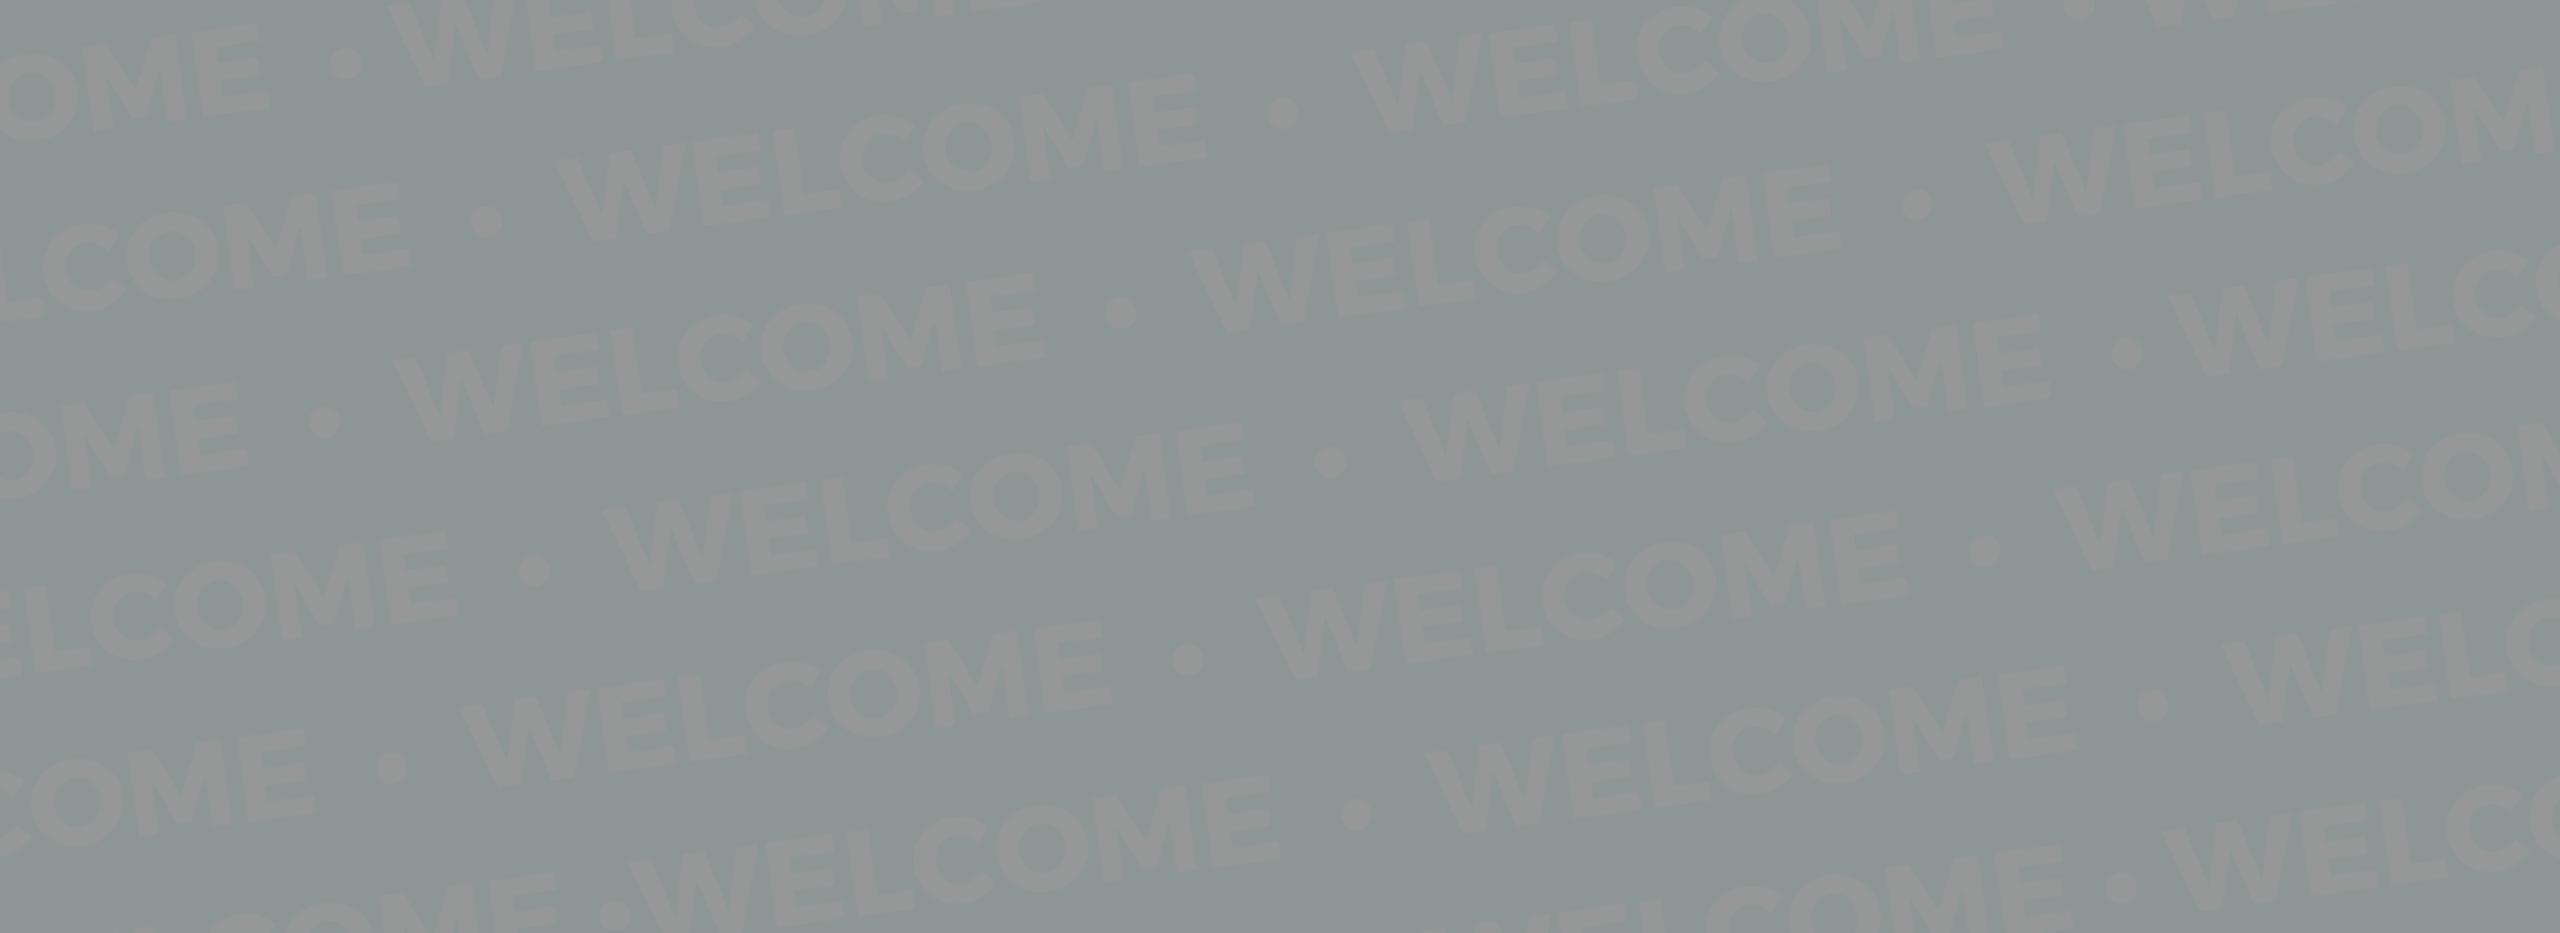 MRE | AP Welcomes New Agent RaMona Clark